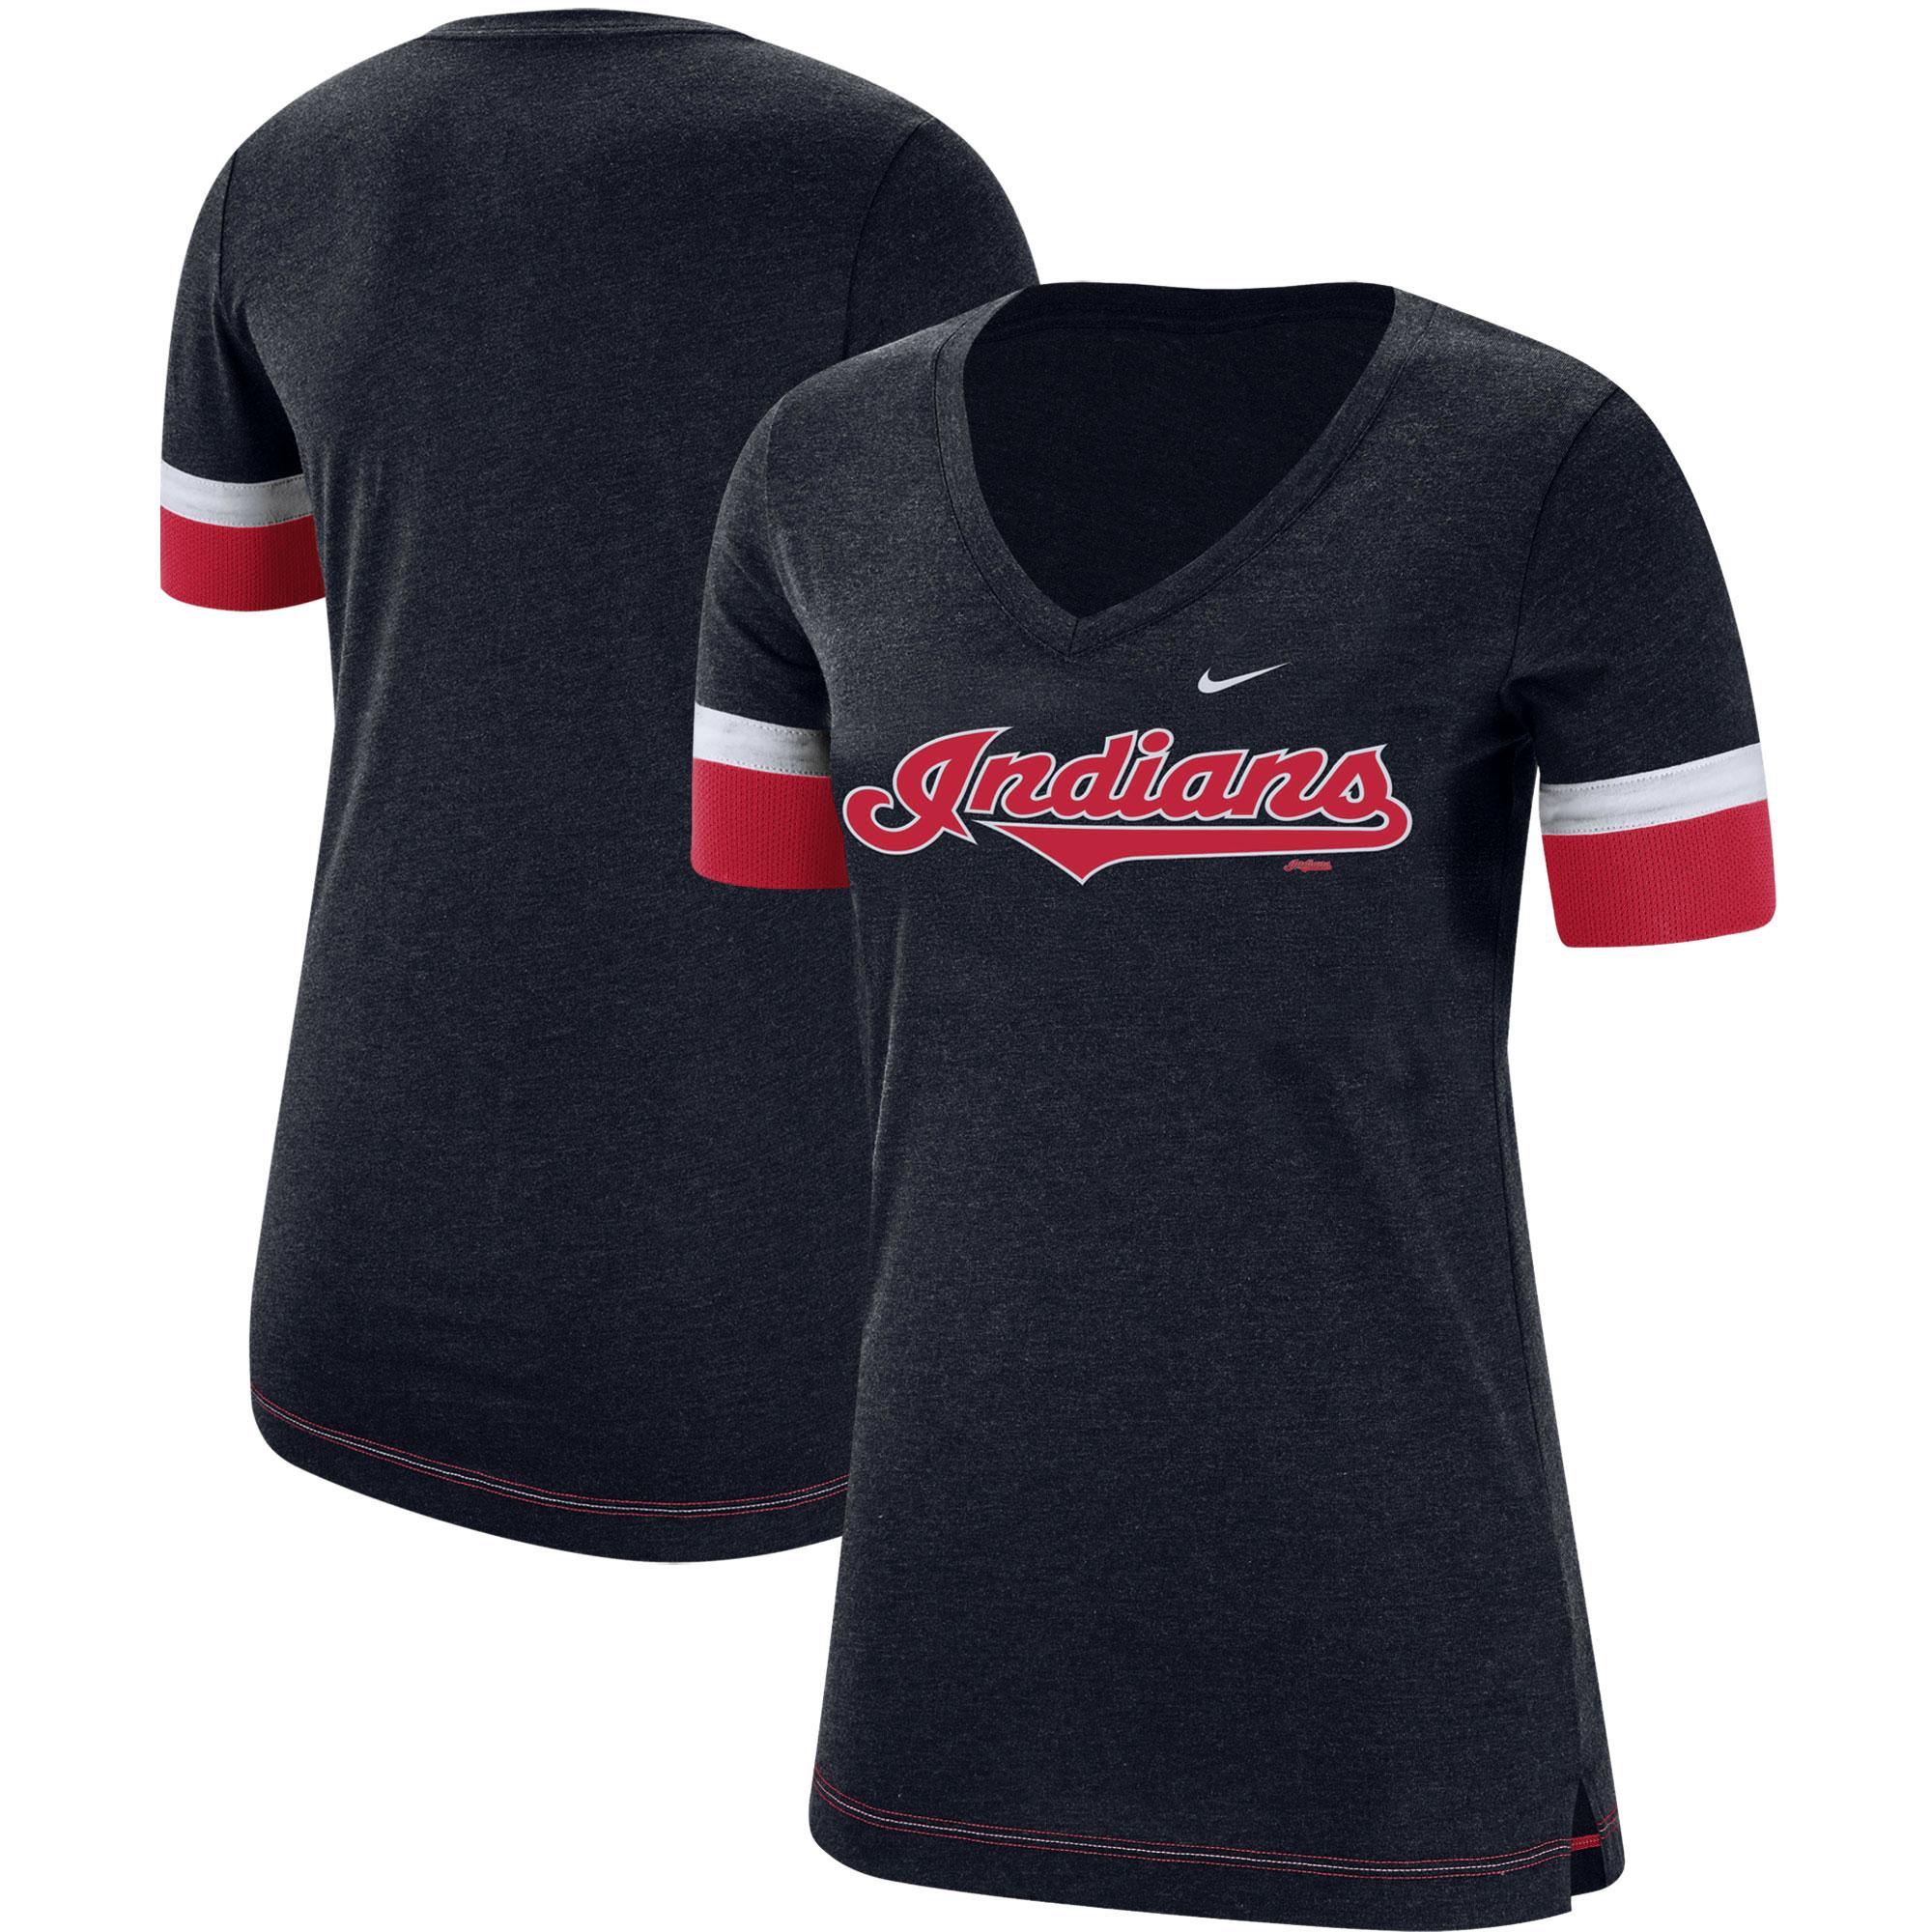 Cleveland Indians Nike Women's Mesh V-Neck T-Shirt - Navy